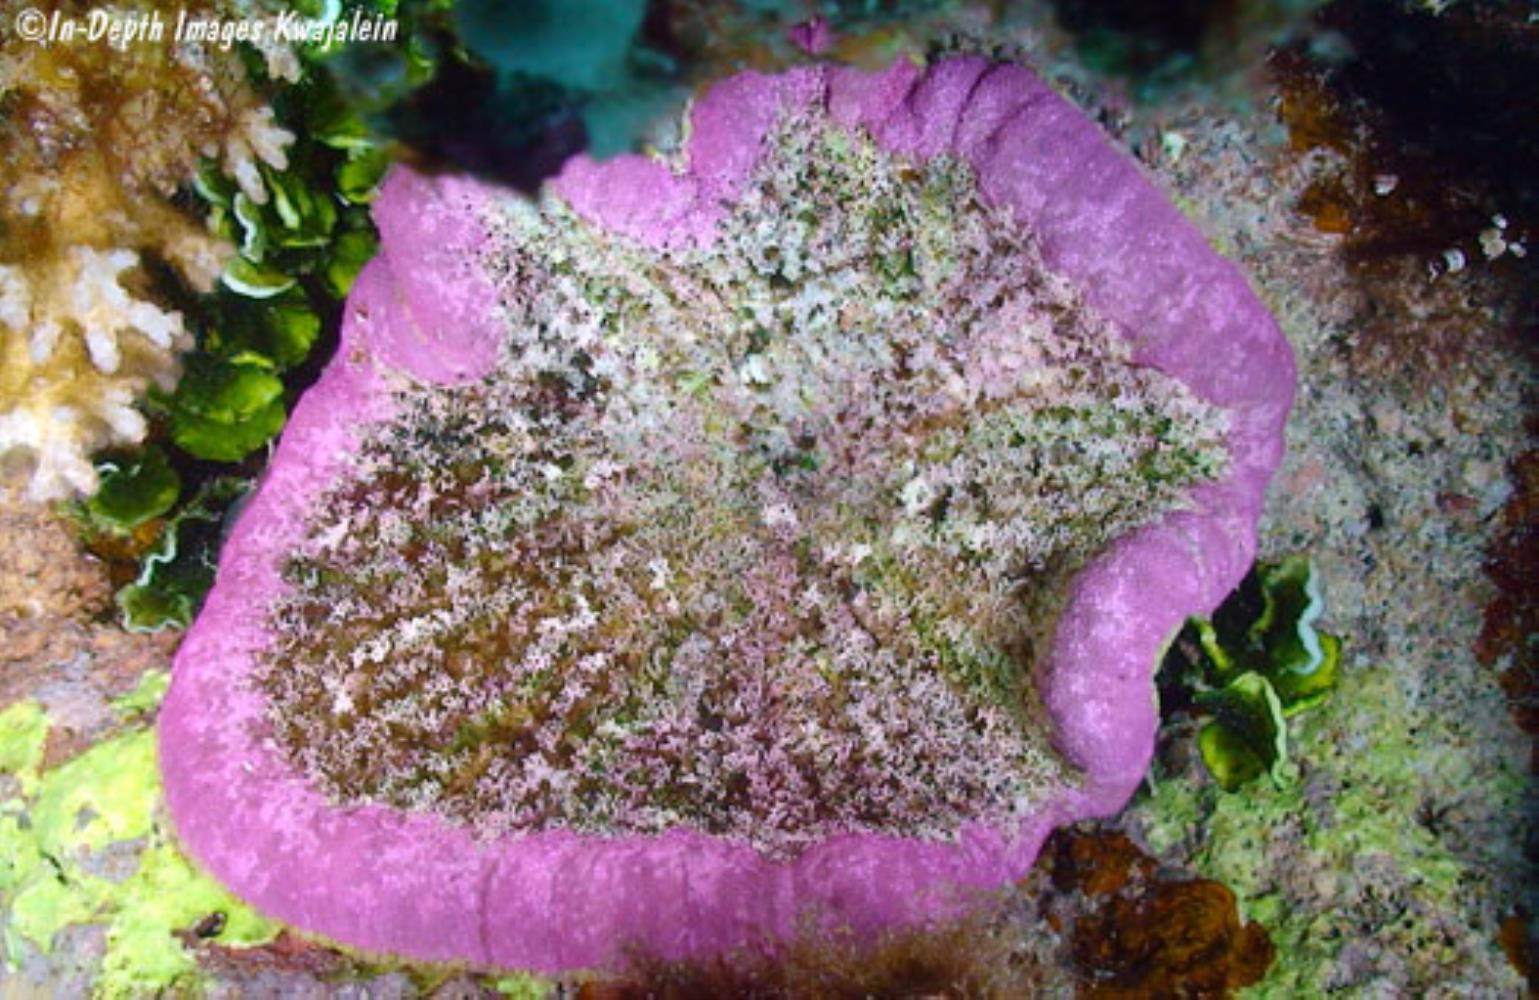 Adhesive Sea Anemone